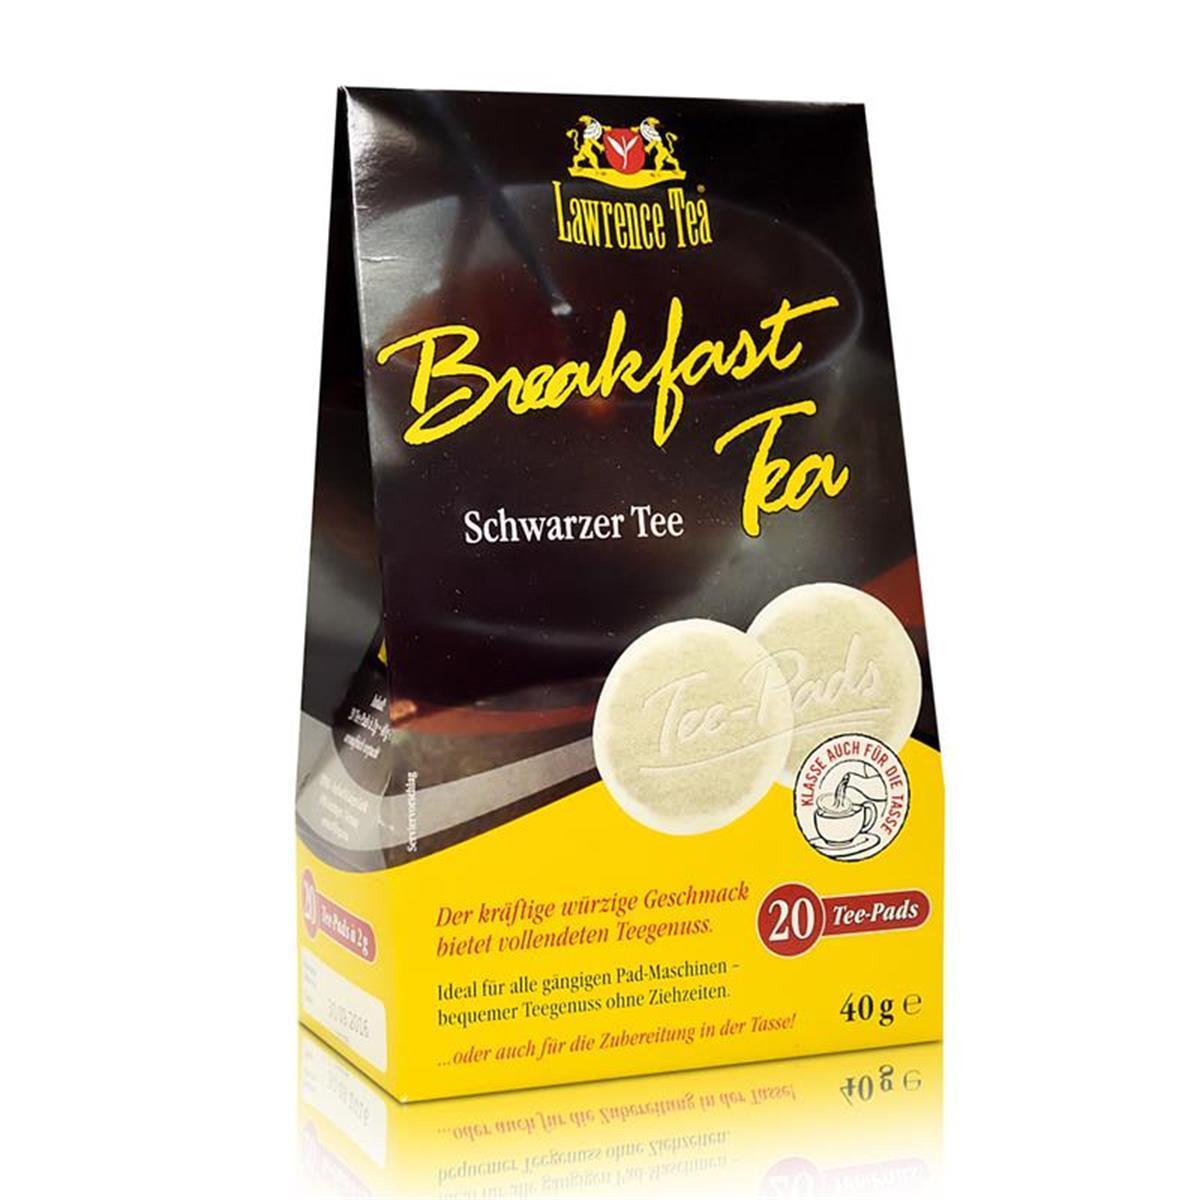 lawrence tea pads breakfast tea schwarzer teesenseo. Black Bedroom Furniture Sets. Home Design Ideas